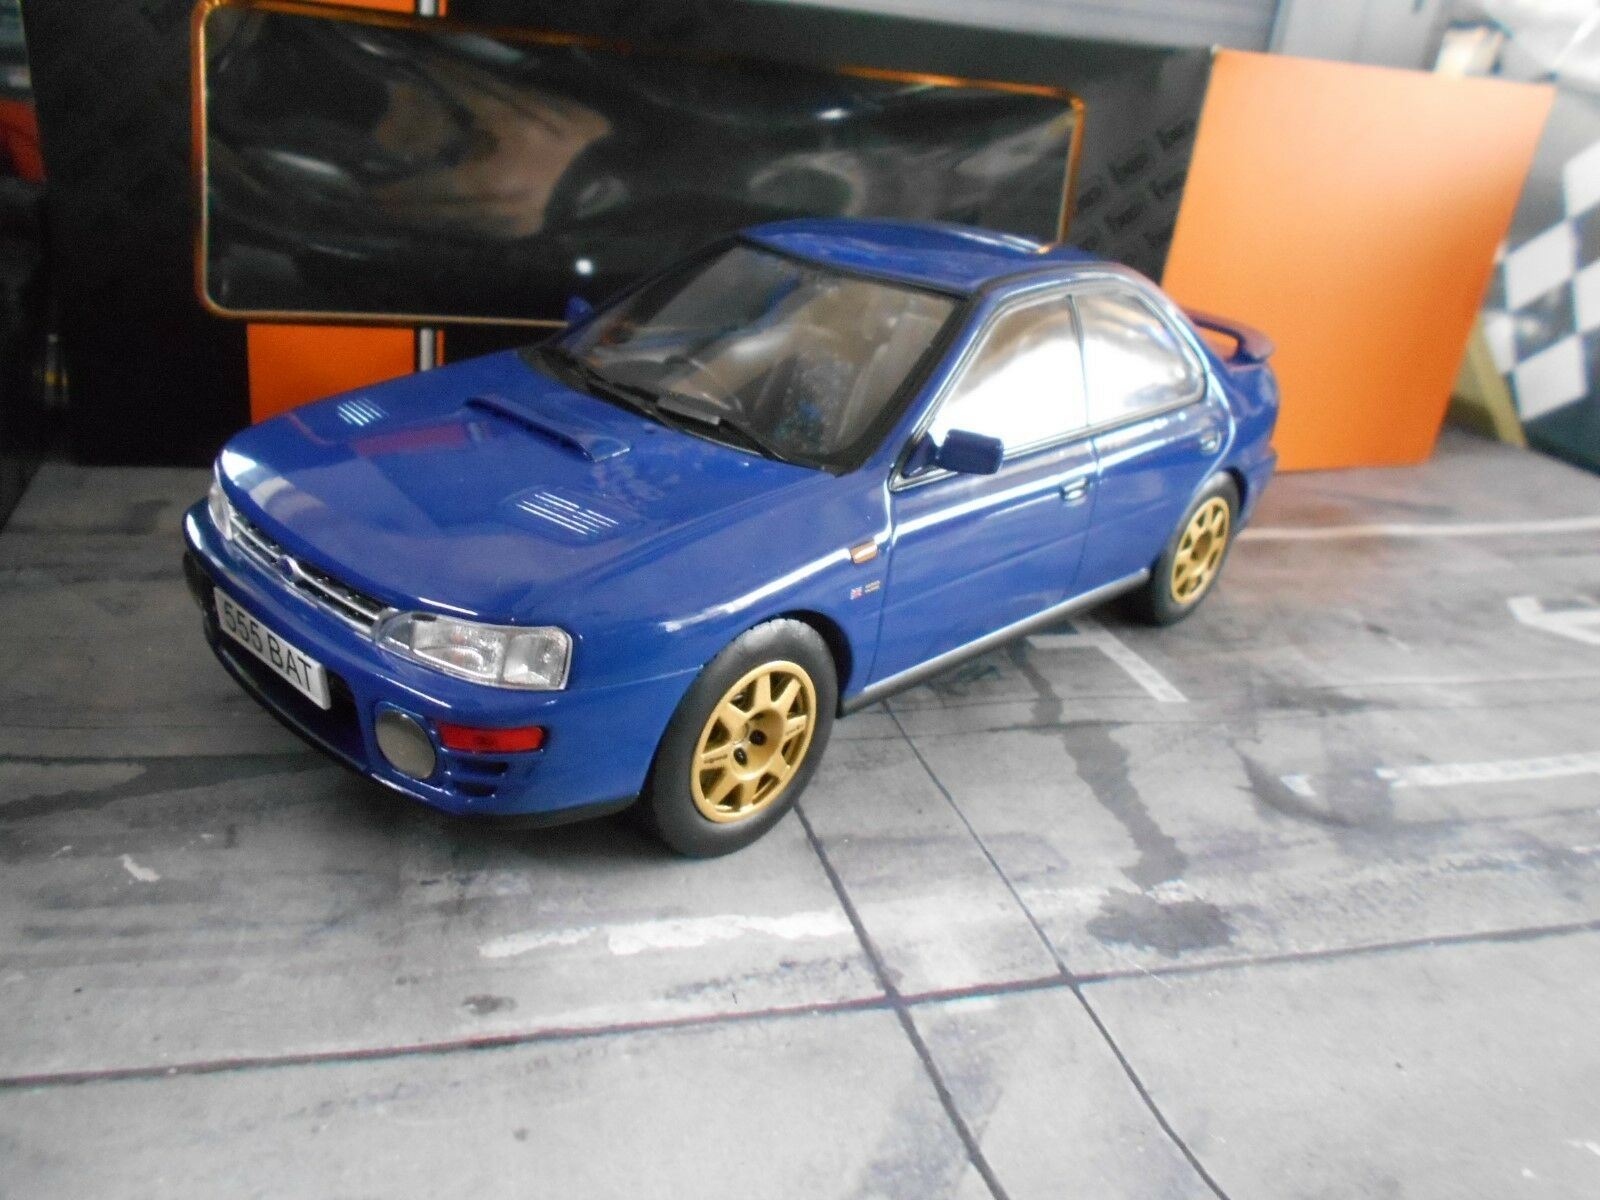 Subaru  Impreza WRX WRC Bleu bleu rue RHD 1995 IXO miniature neuf nouveau 1 18  Nouvelle liste